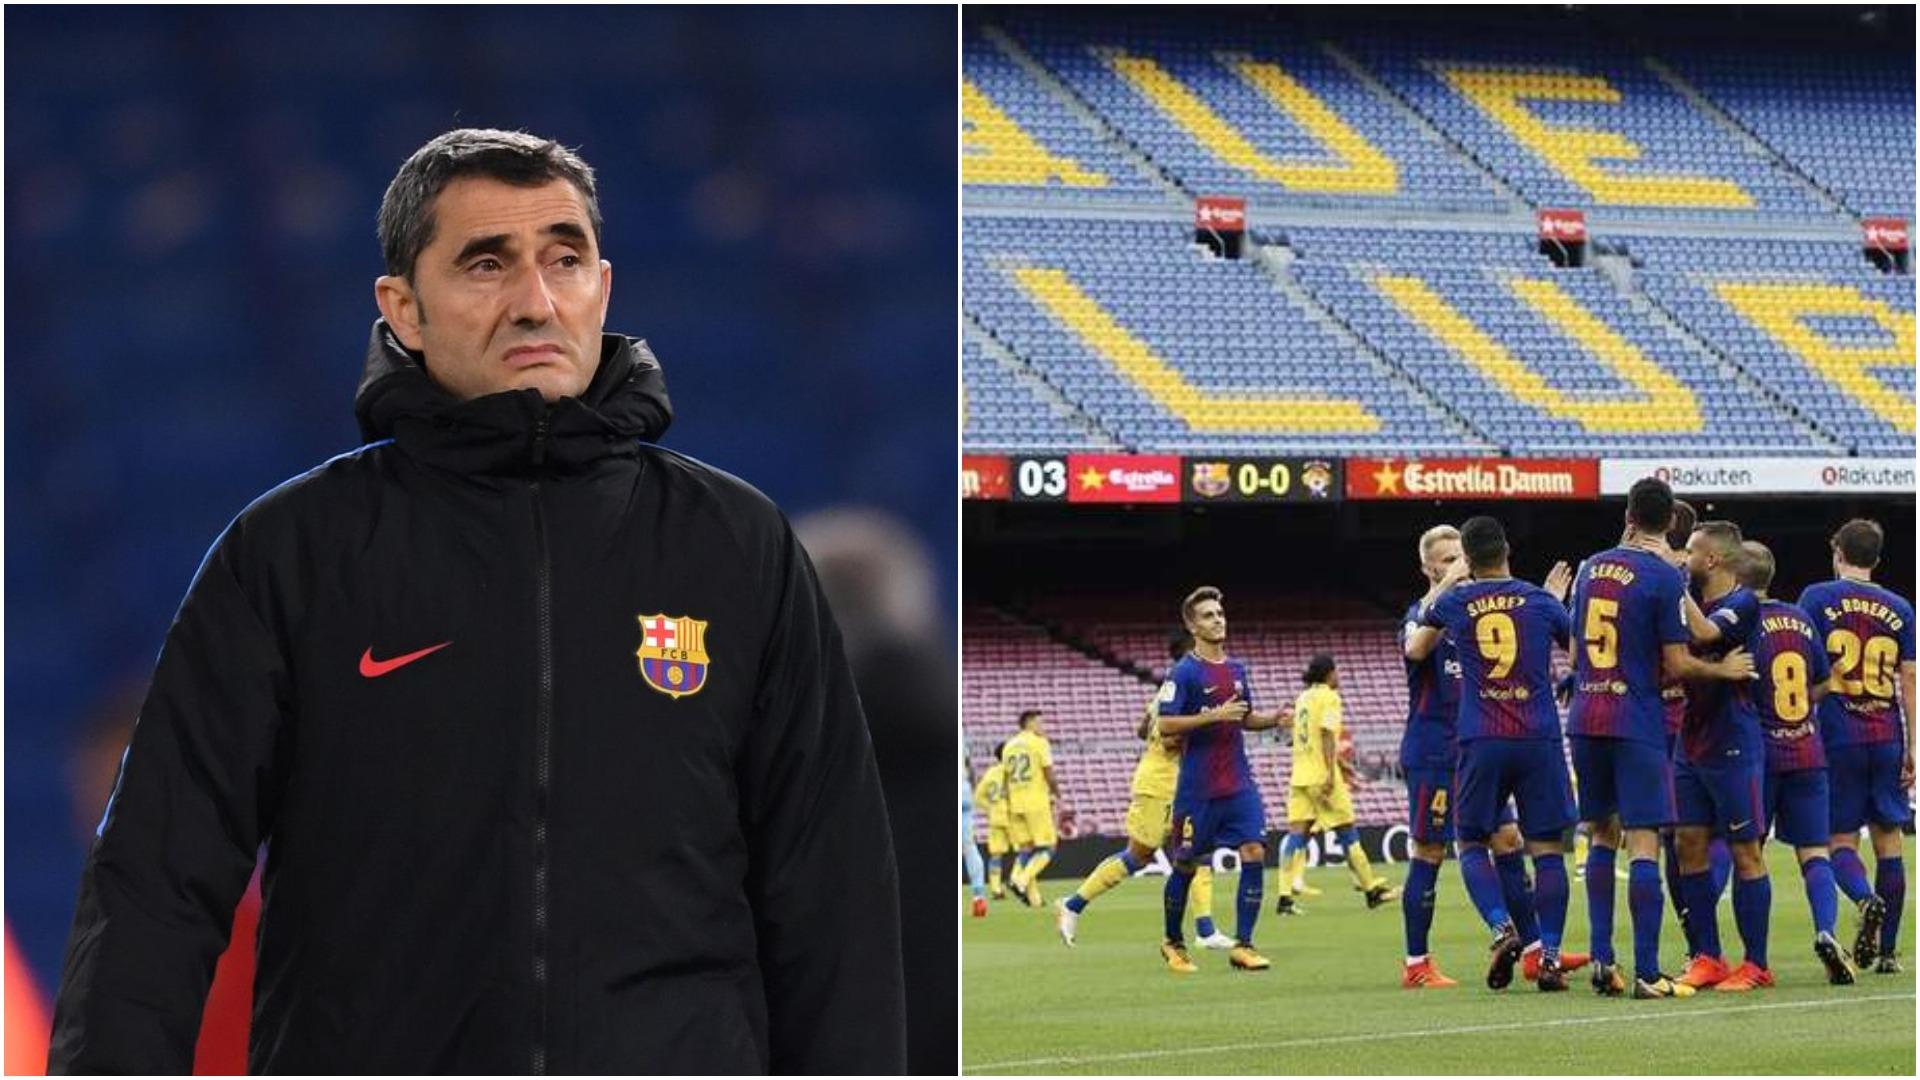 Stadiumi bosh, Valverde: S'e harroj ndeshjen me Las Palmas, ishte tmerr